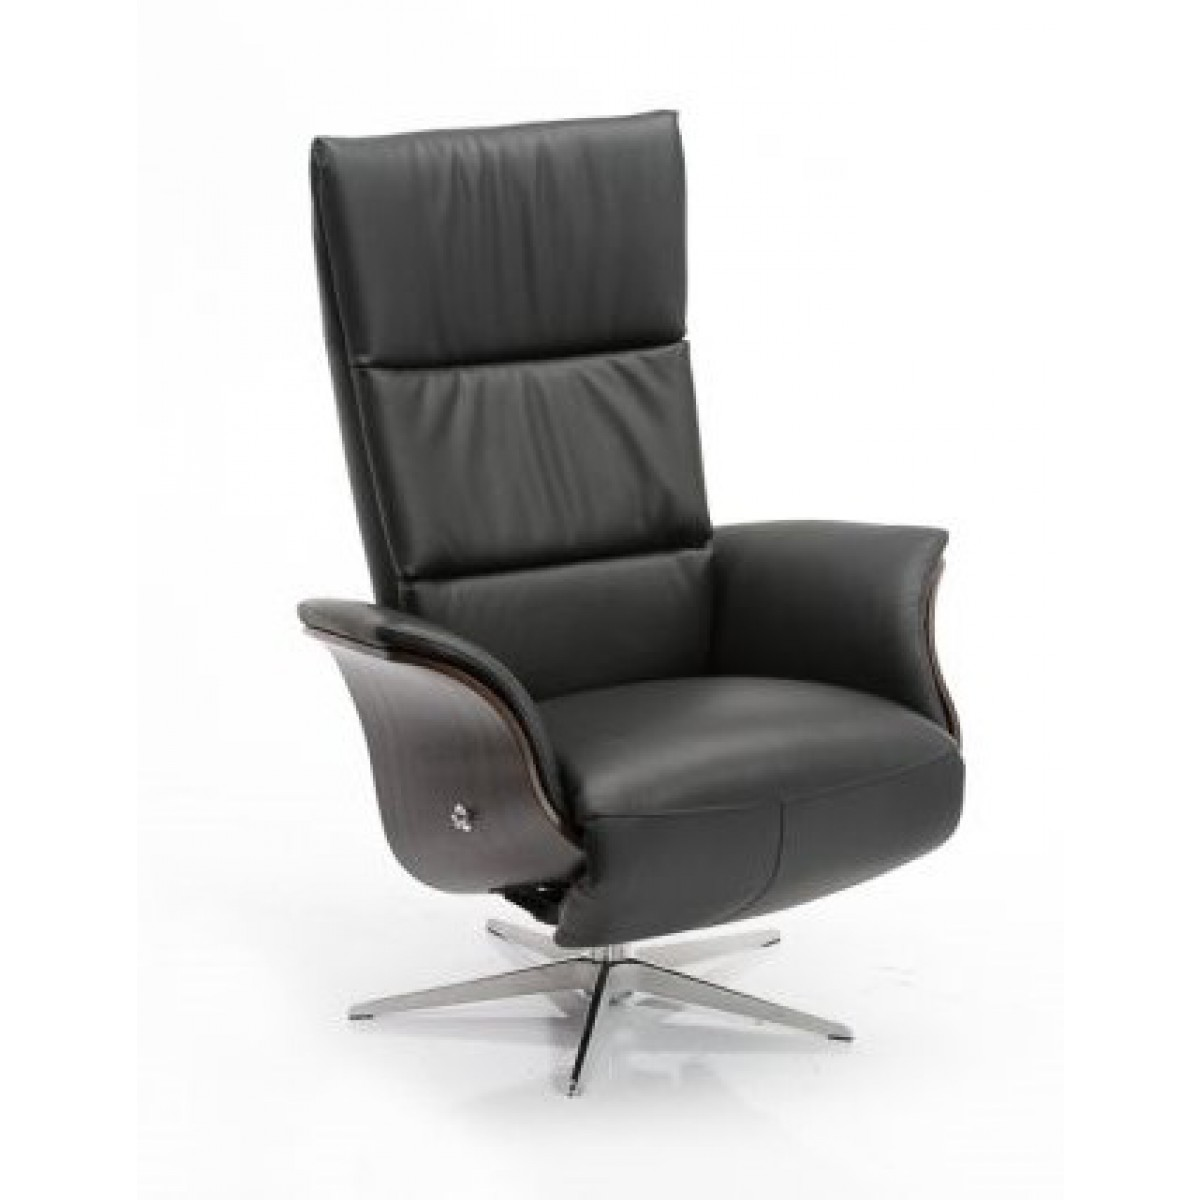 Relaxsessel design  Frejus relaxsessel   Hjort Knudsen   I Live Design Preisgünstig ...